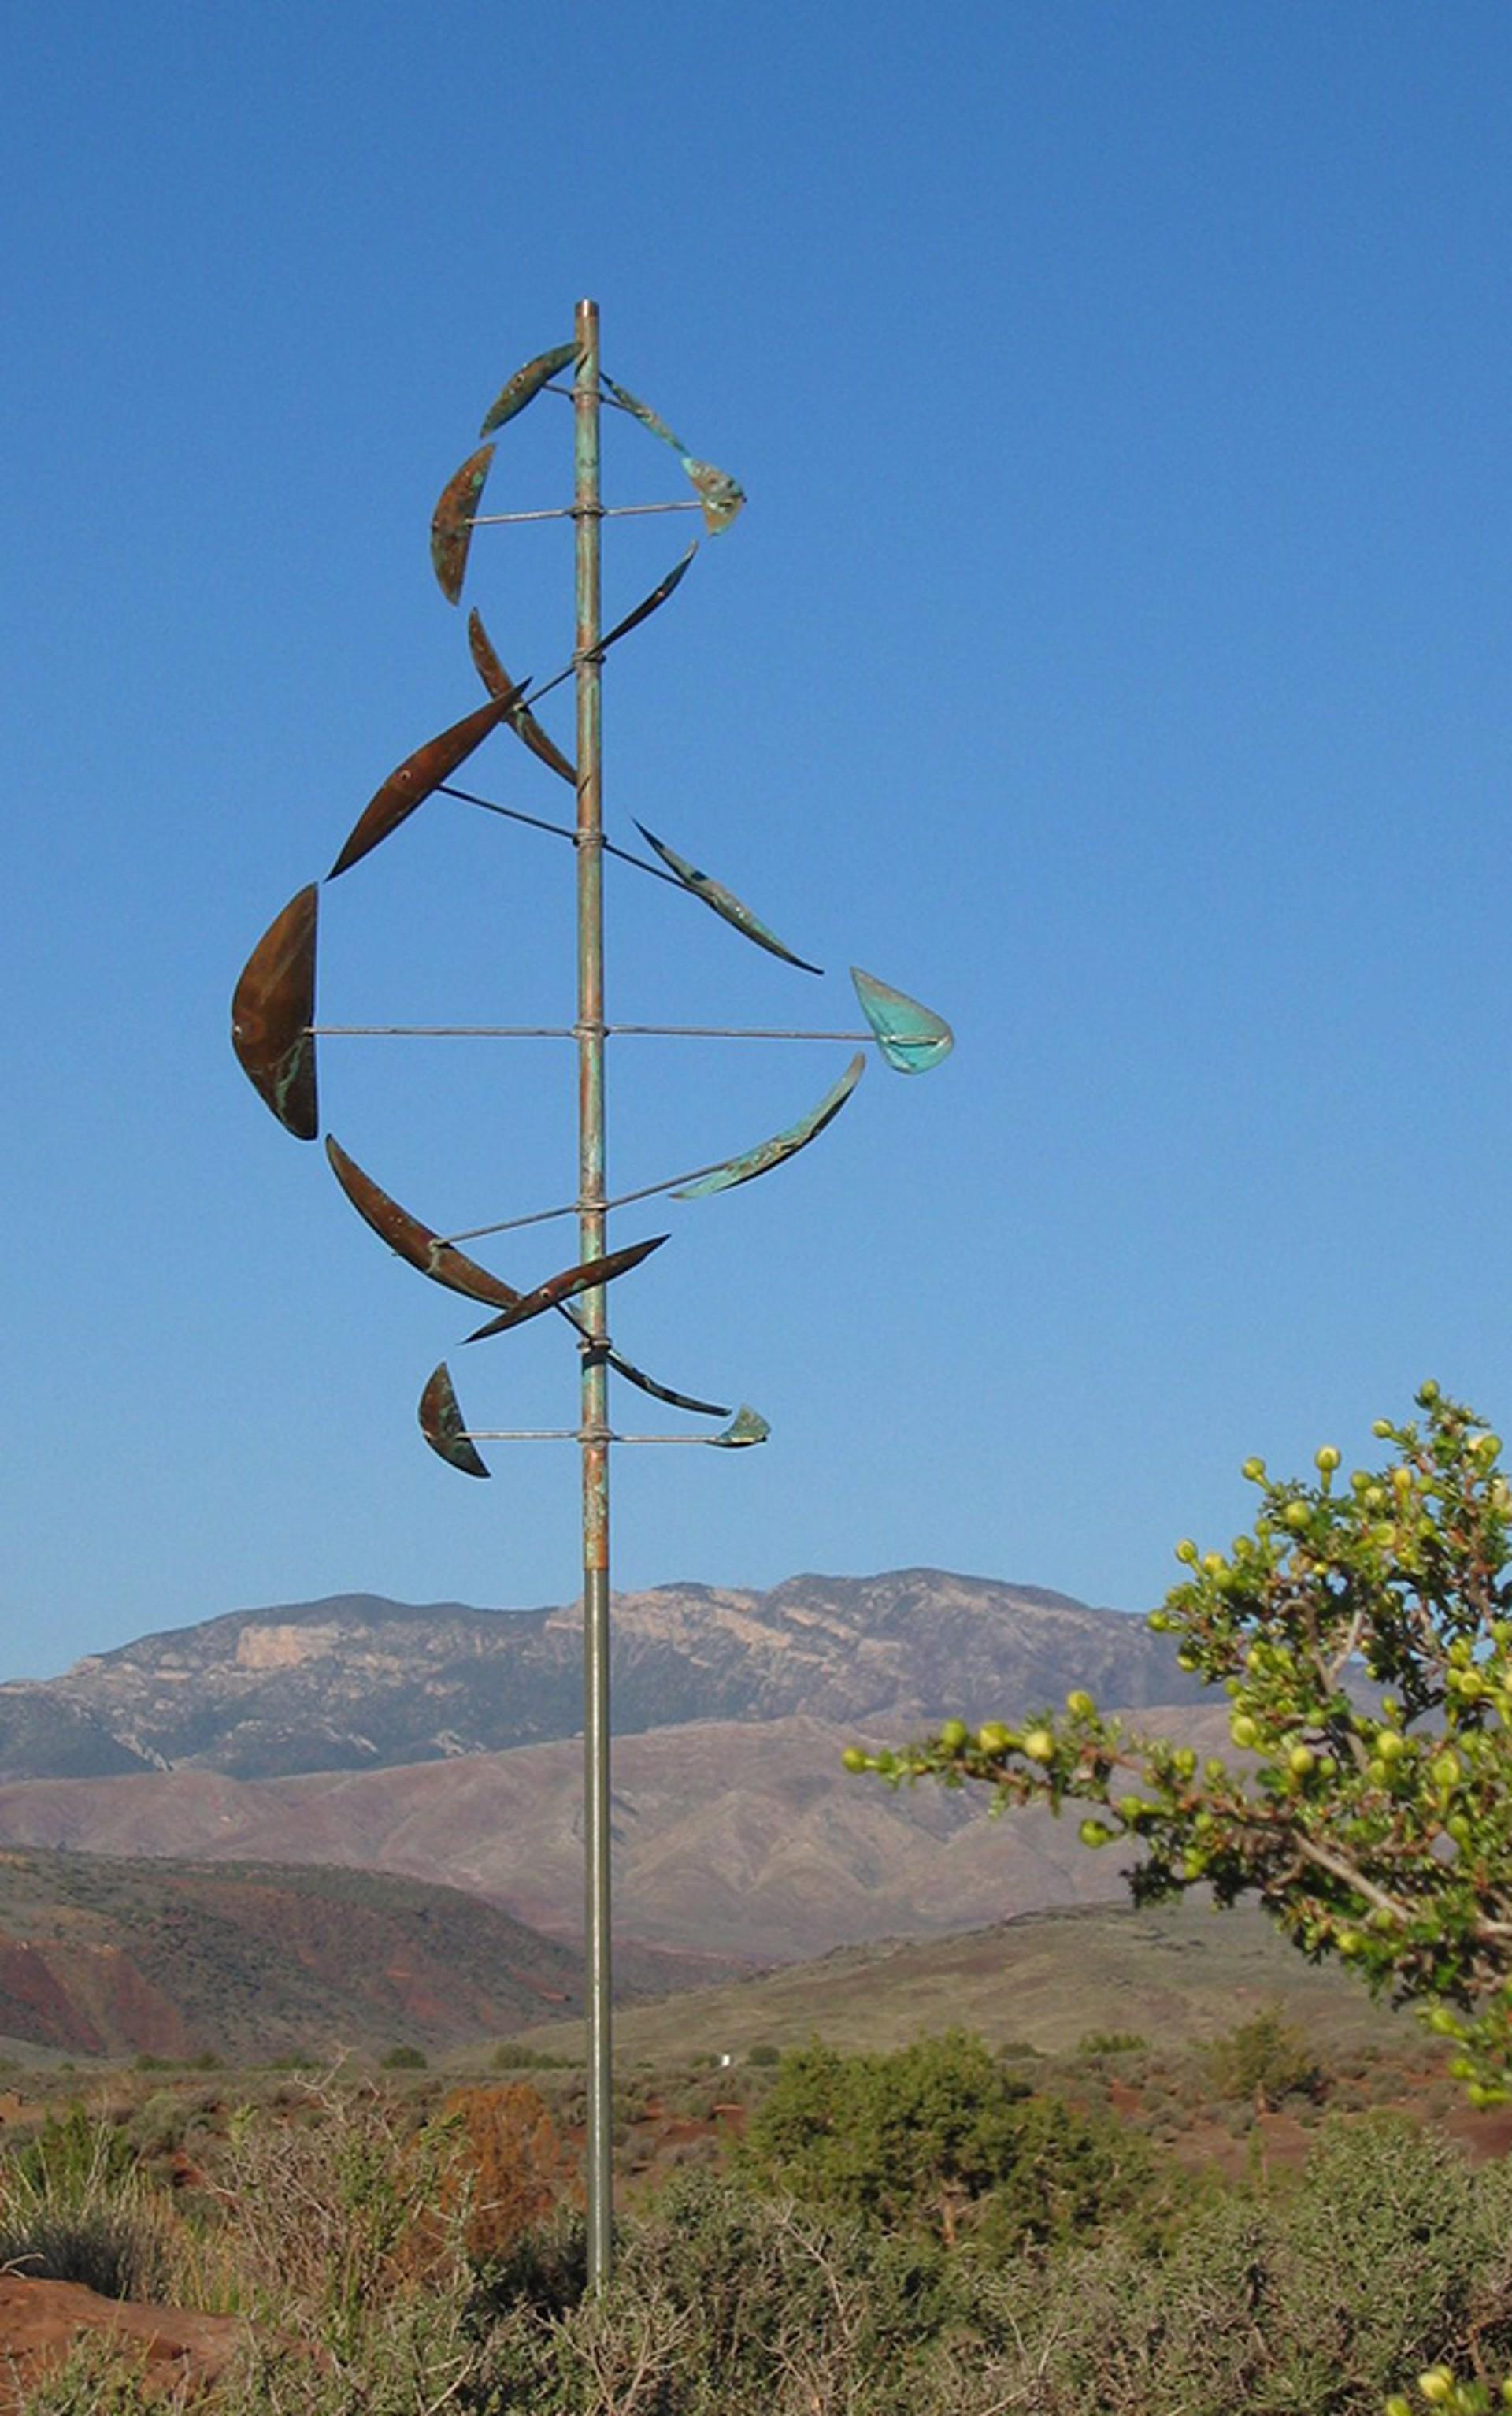 Wind Dancer by Lyman Whitaker